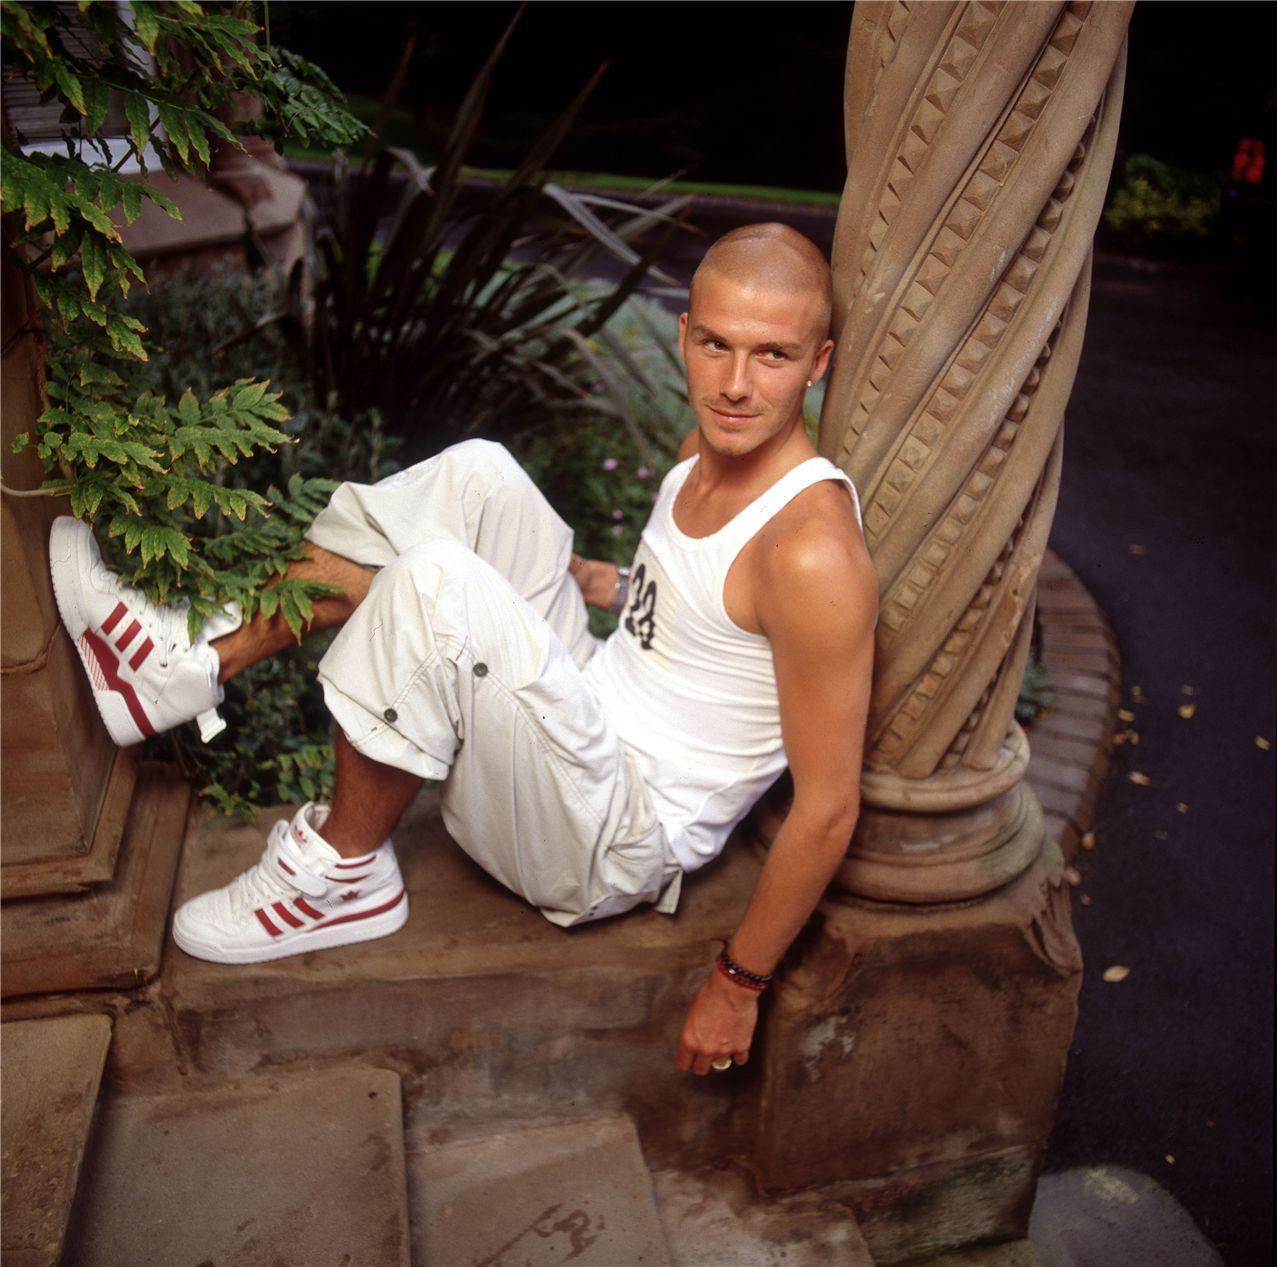 Дэвид Бекхем / David Beckham by John Rogers